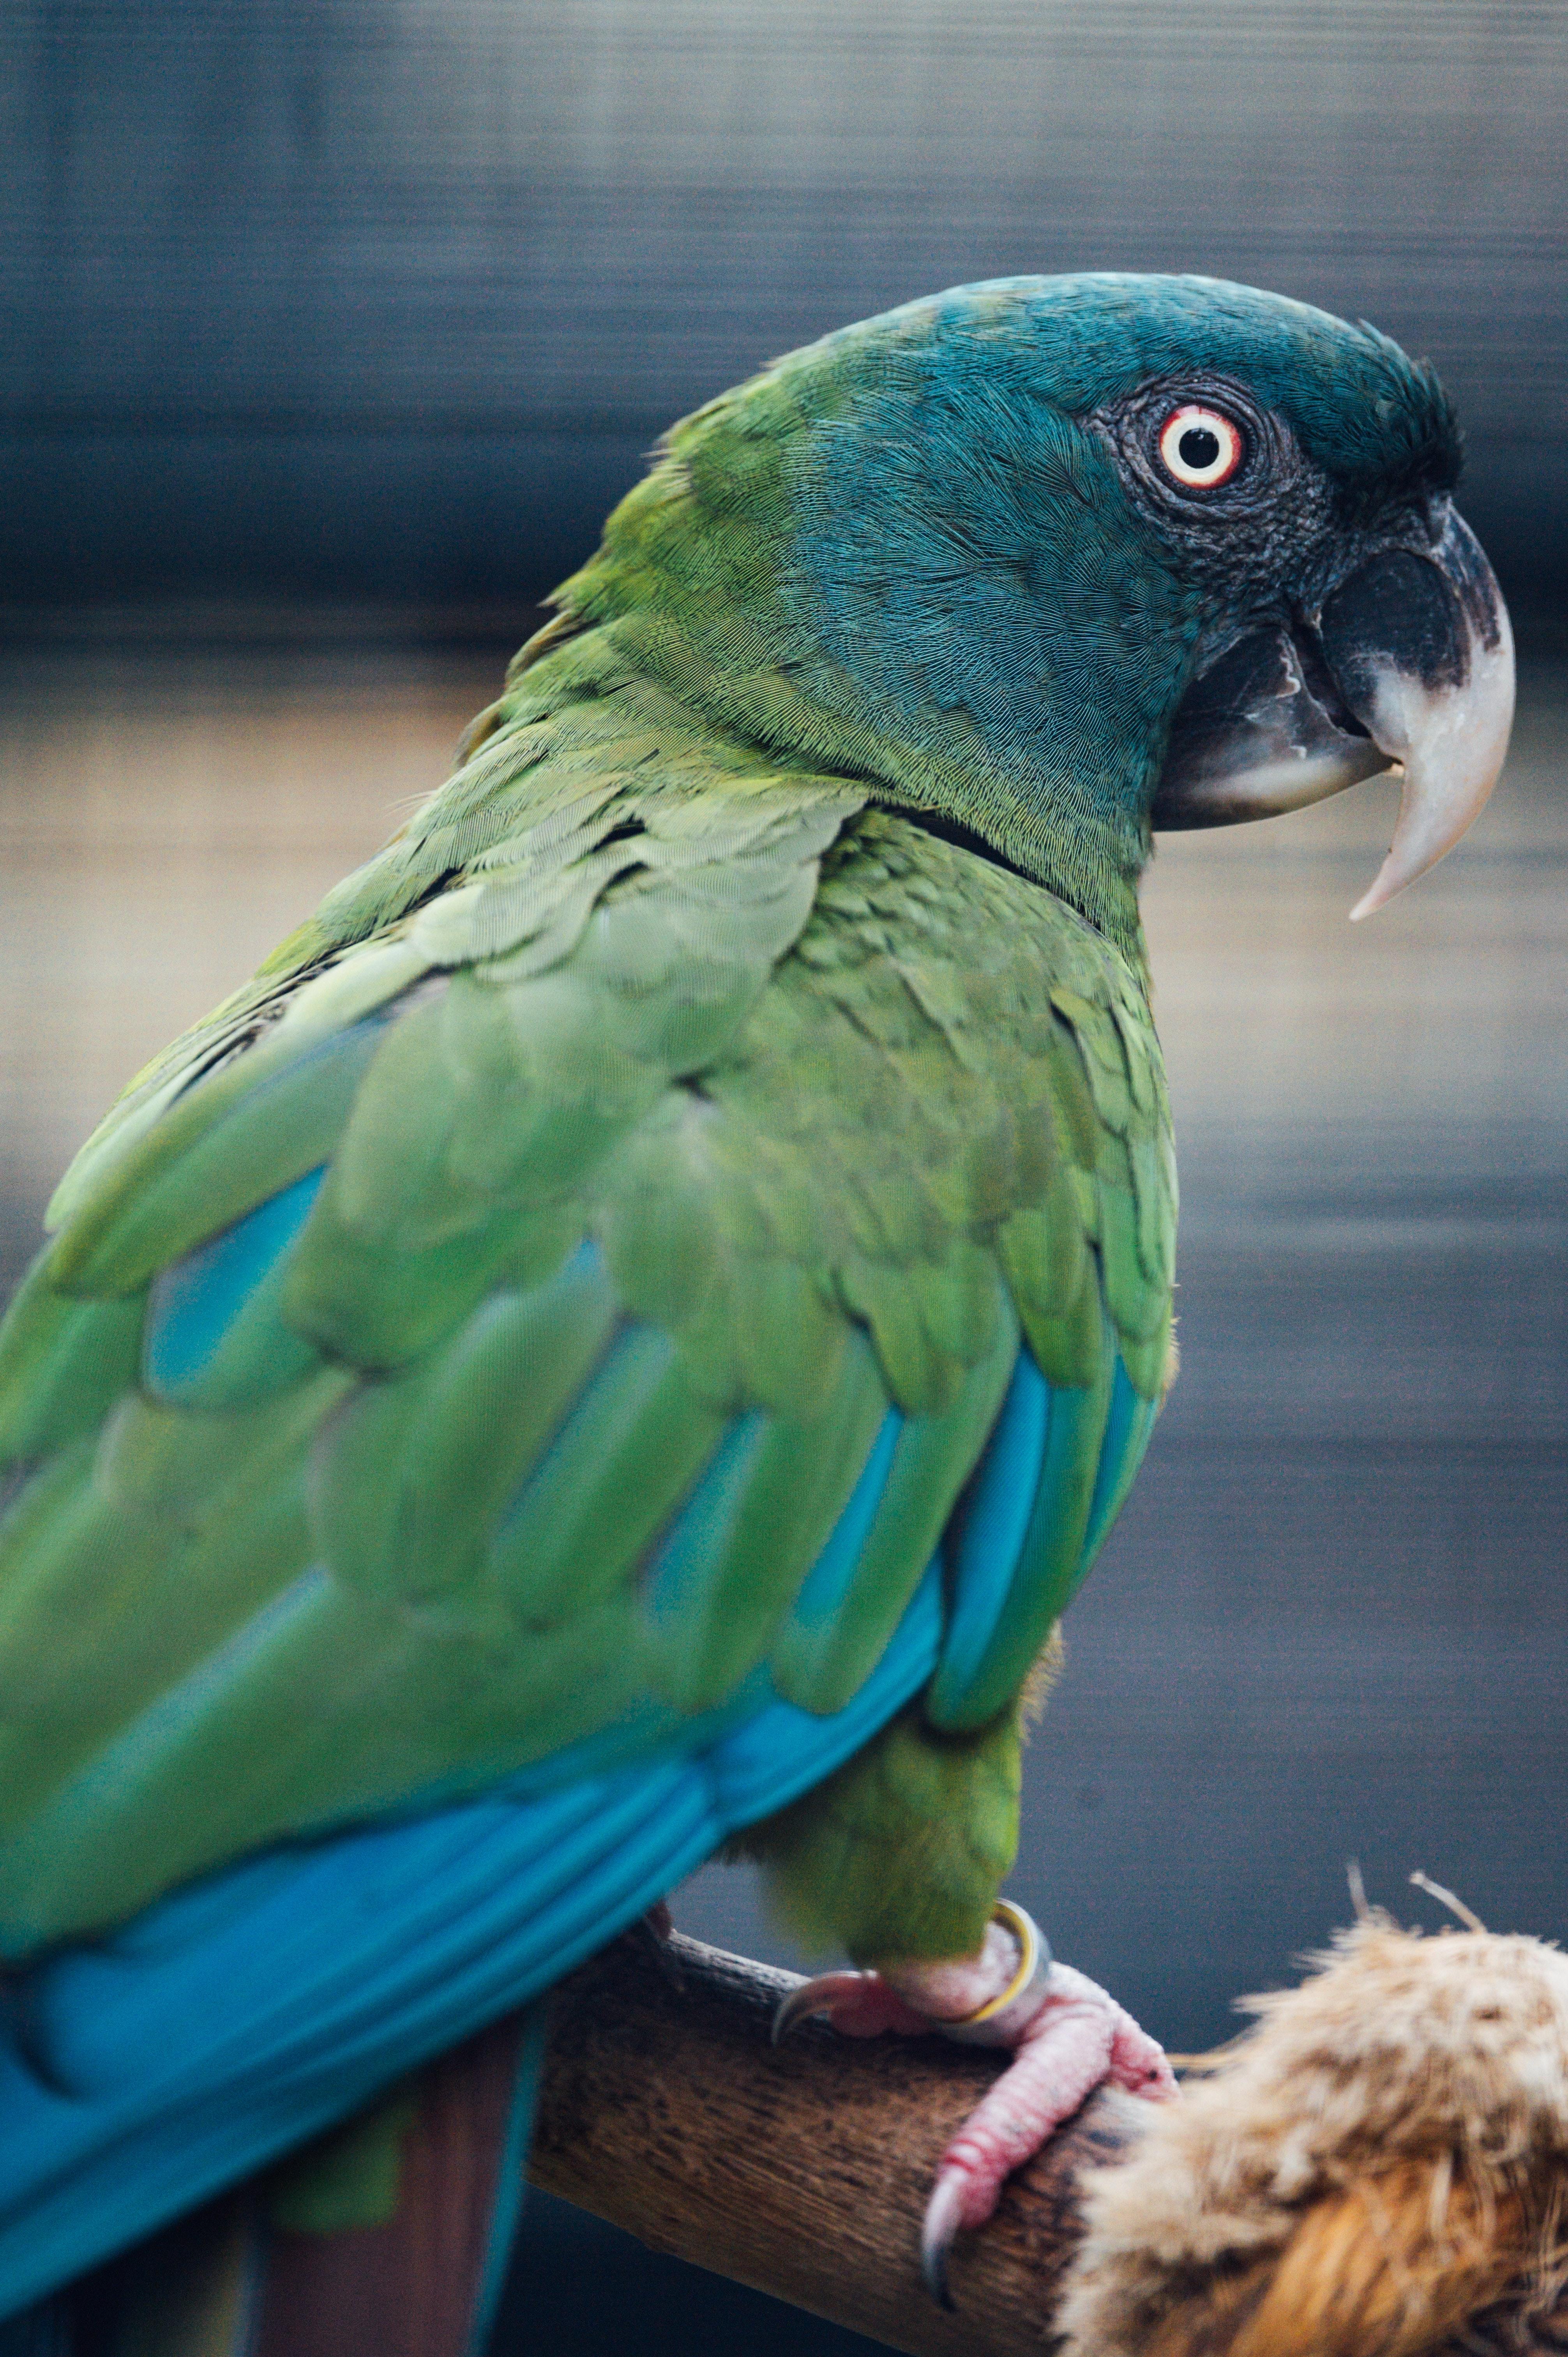 94518 descarga Verde fondos de pantalla para tu teléfono gratis, Animales, Loros, Pájaro Verde imágenes y protectores de pantalla para tu teléfono